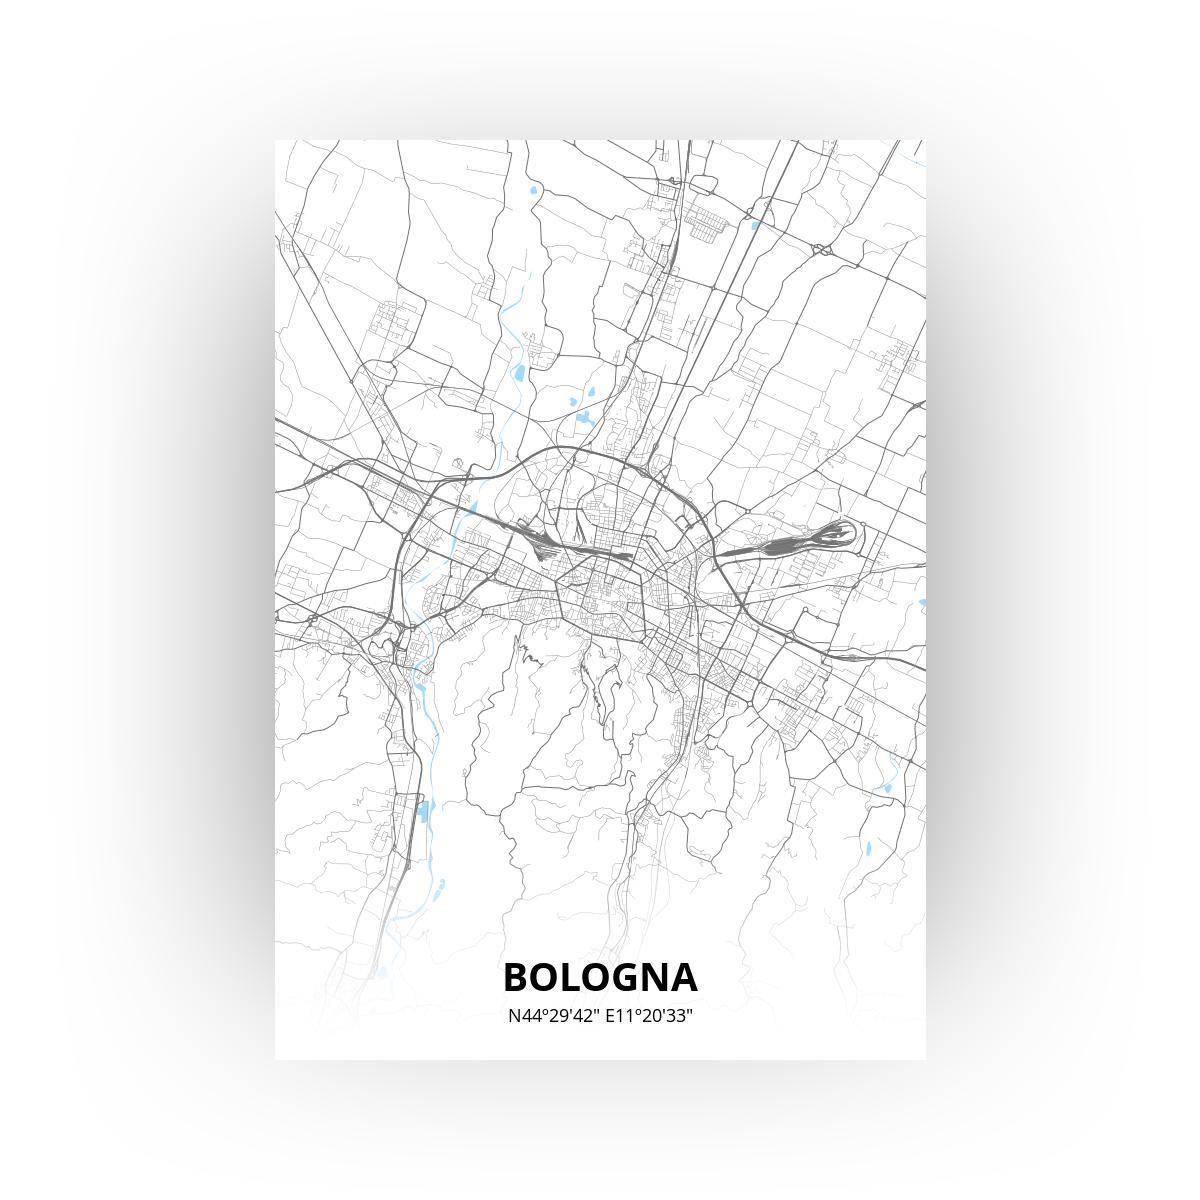 Bologna print - Standaard stijl